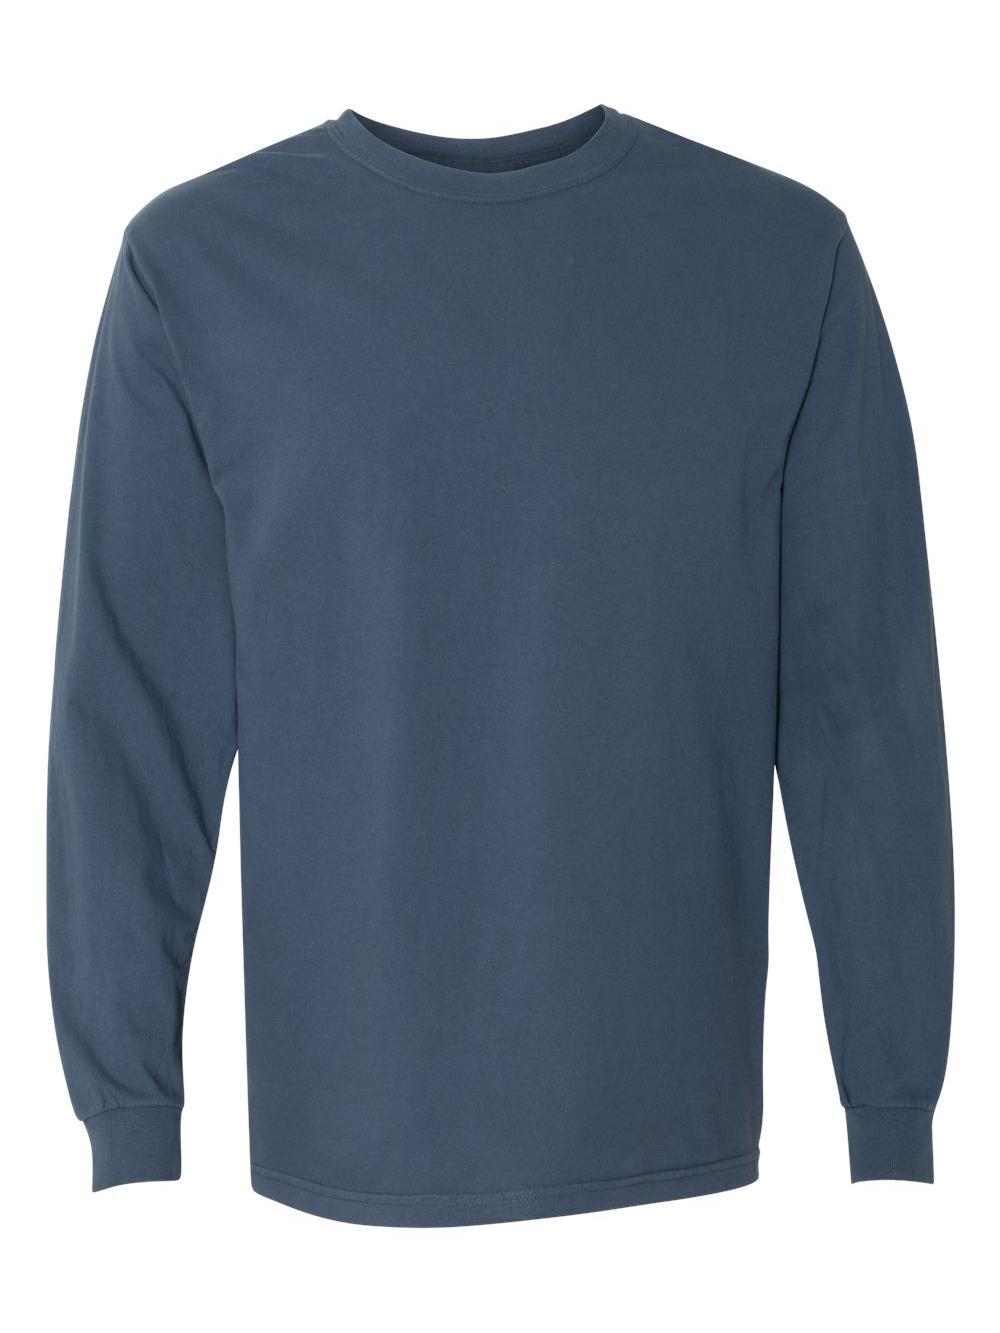 Comfort-Colors-Garment-Dyed-Heavyweight-Ringspun-Long-Sleeve-T-Shirt-6014 thumbnail 51